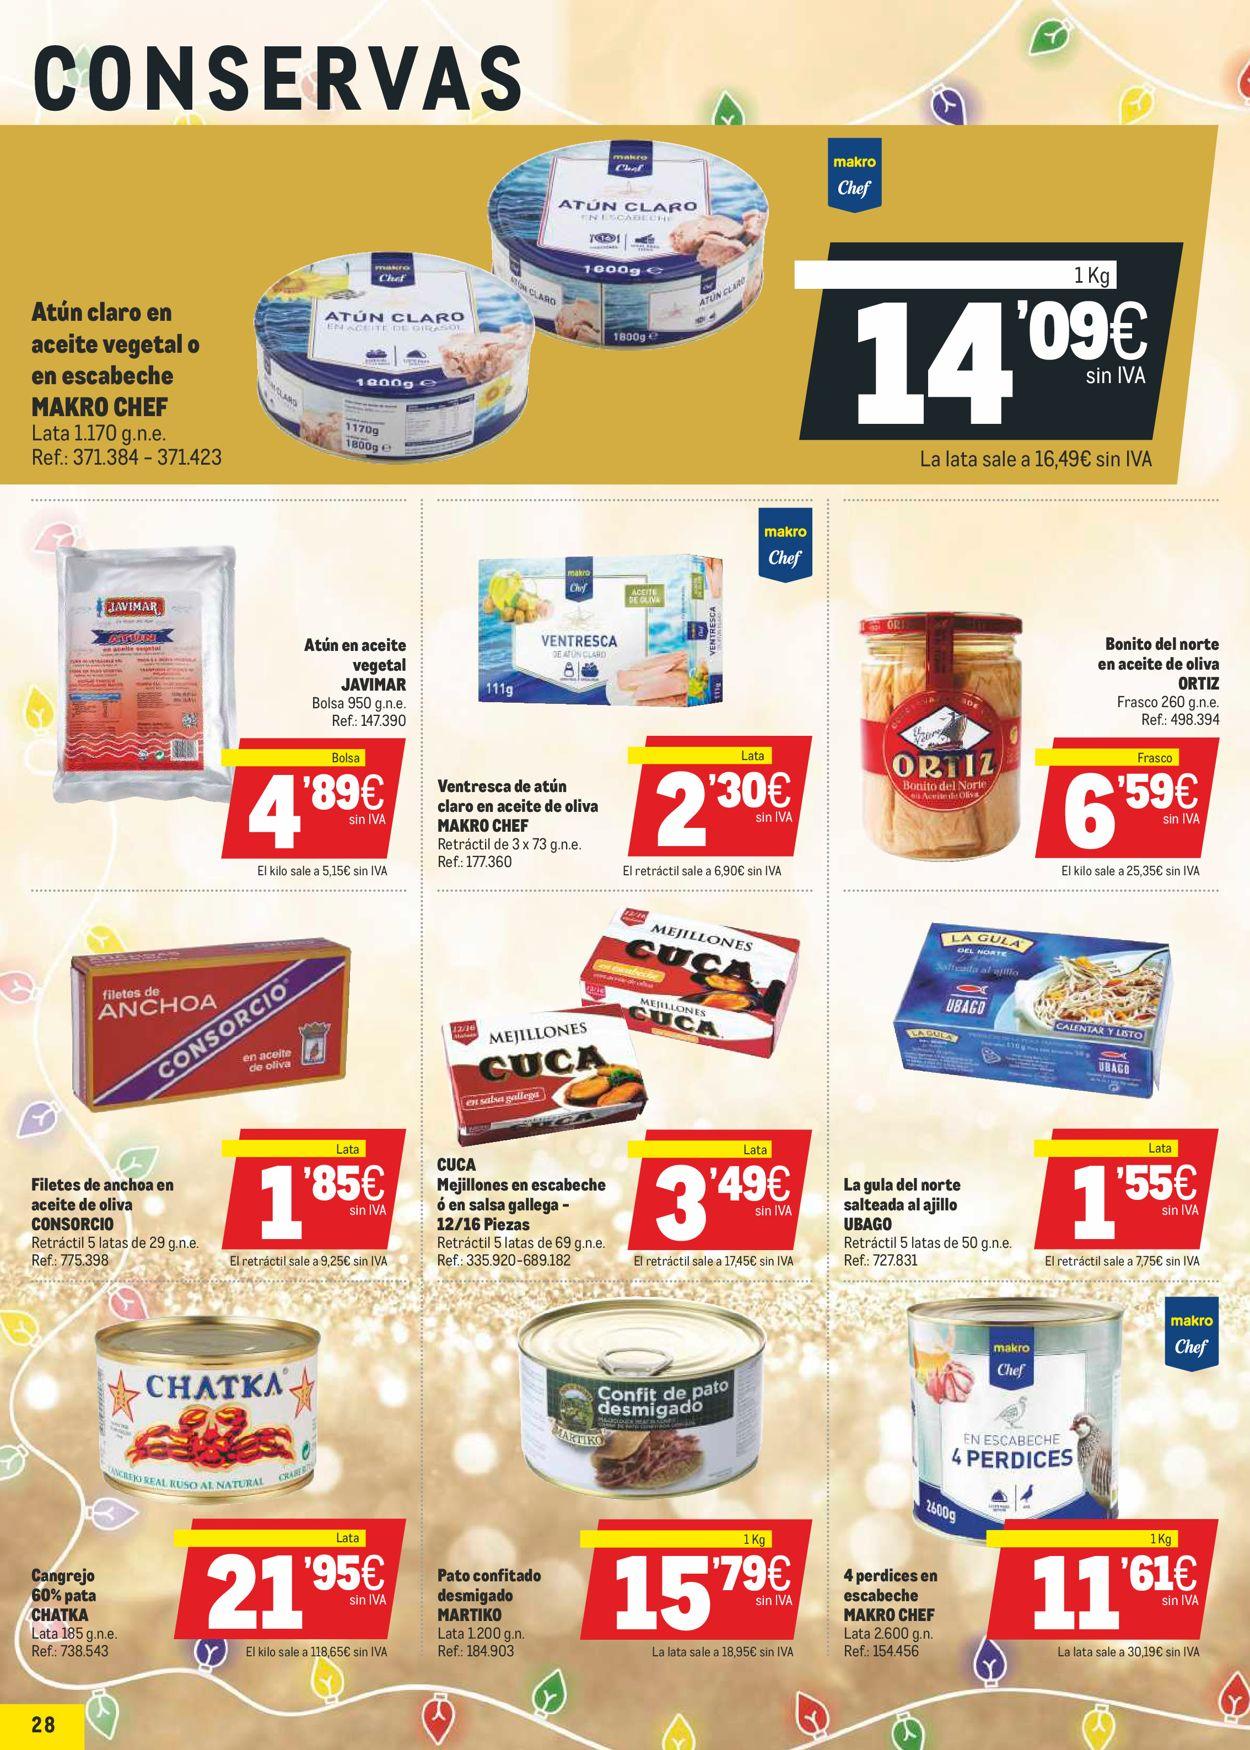 Makro La Navidad Mas Gastro 2020 Folleto - 17.12-05.01.2021 (Página 28)